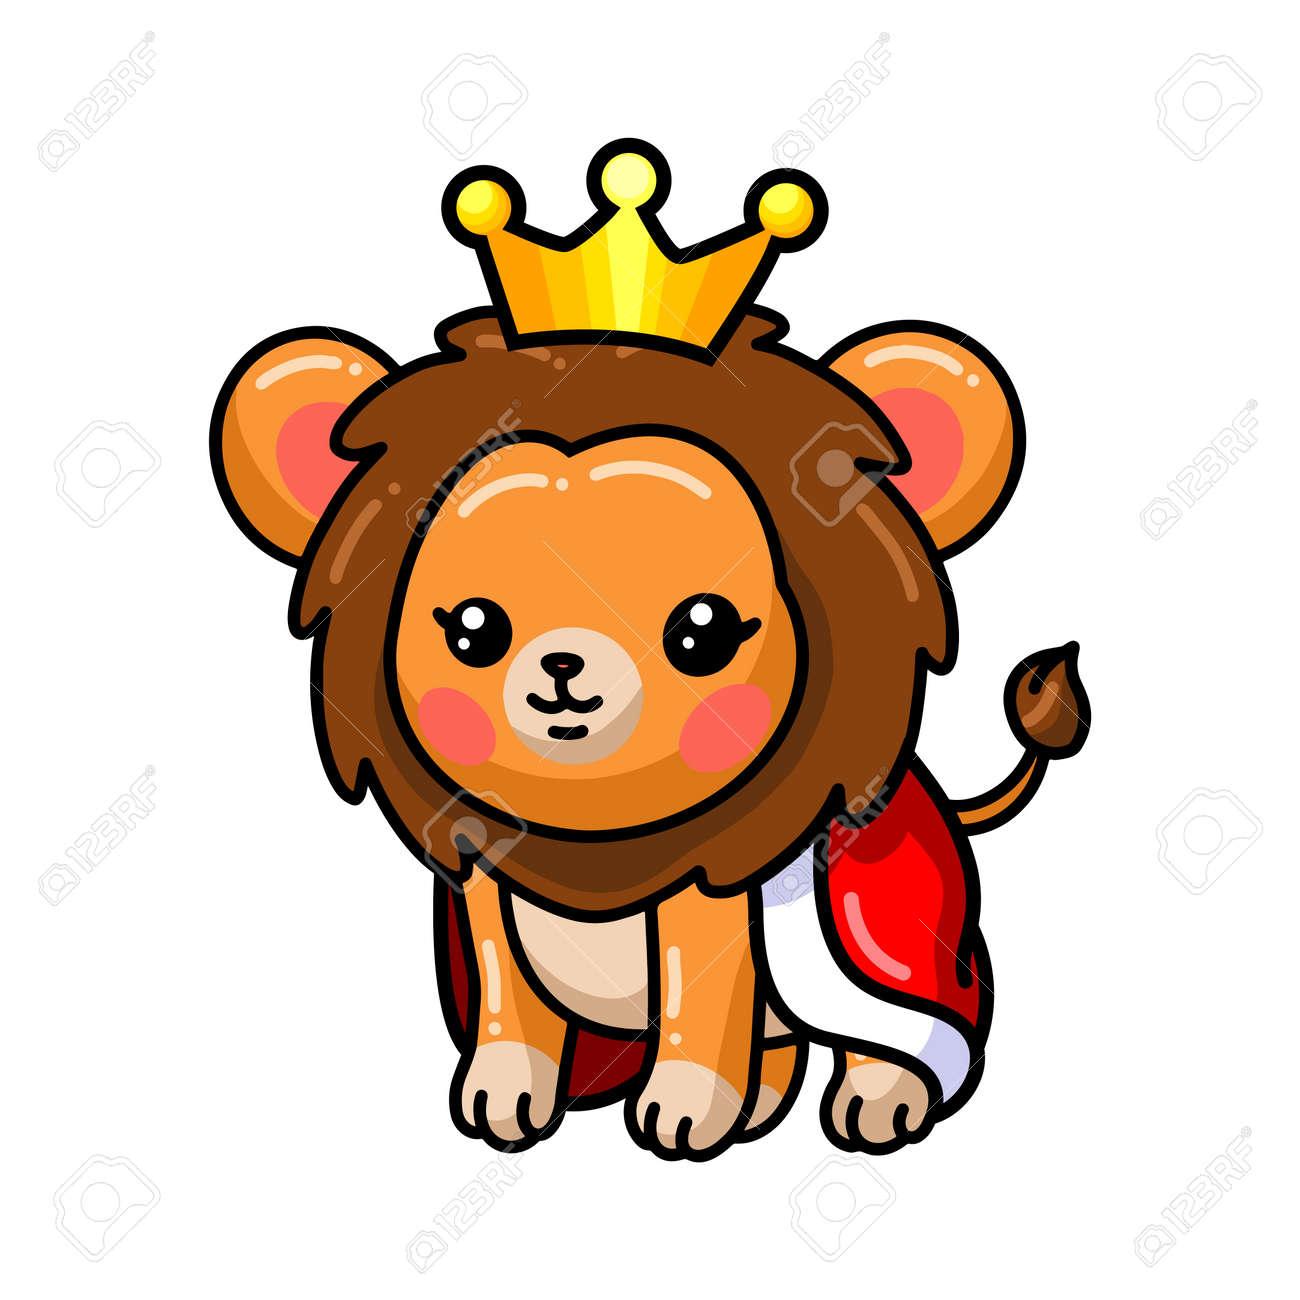 Cute baby lion king cartoon - 171450253